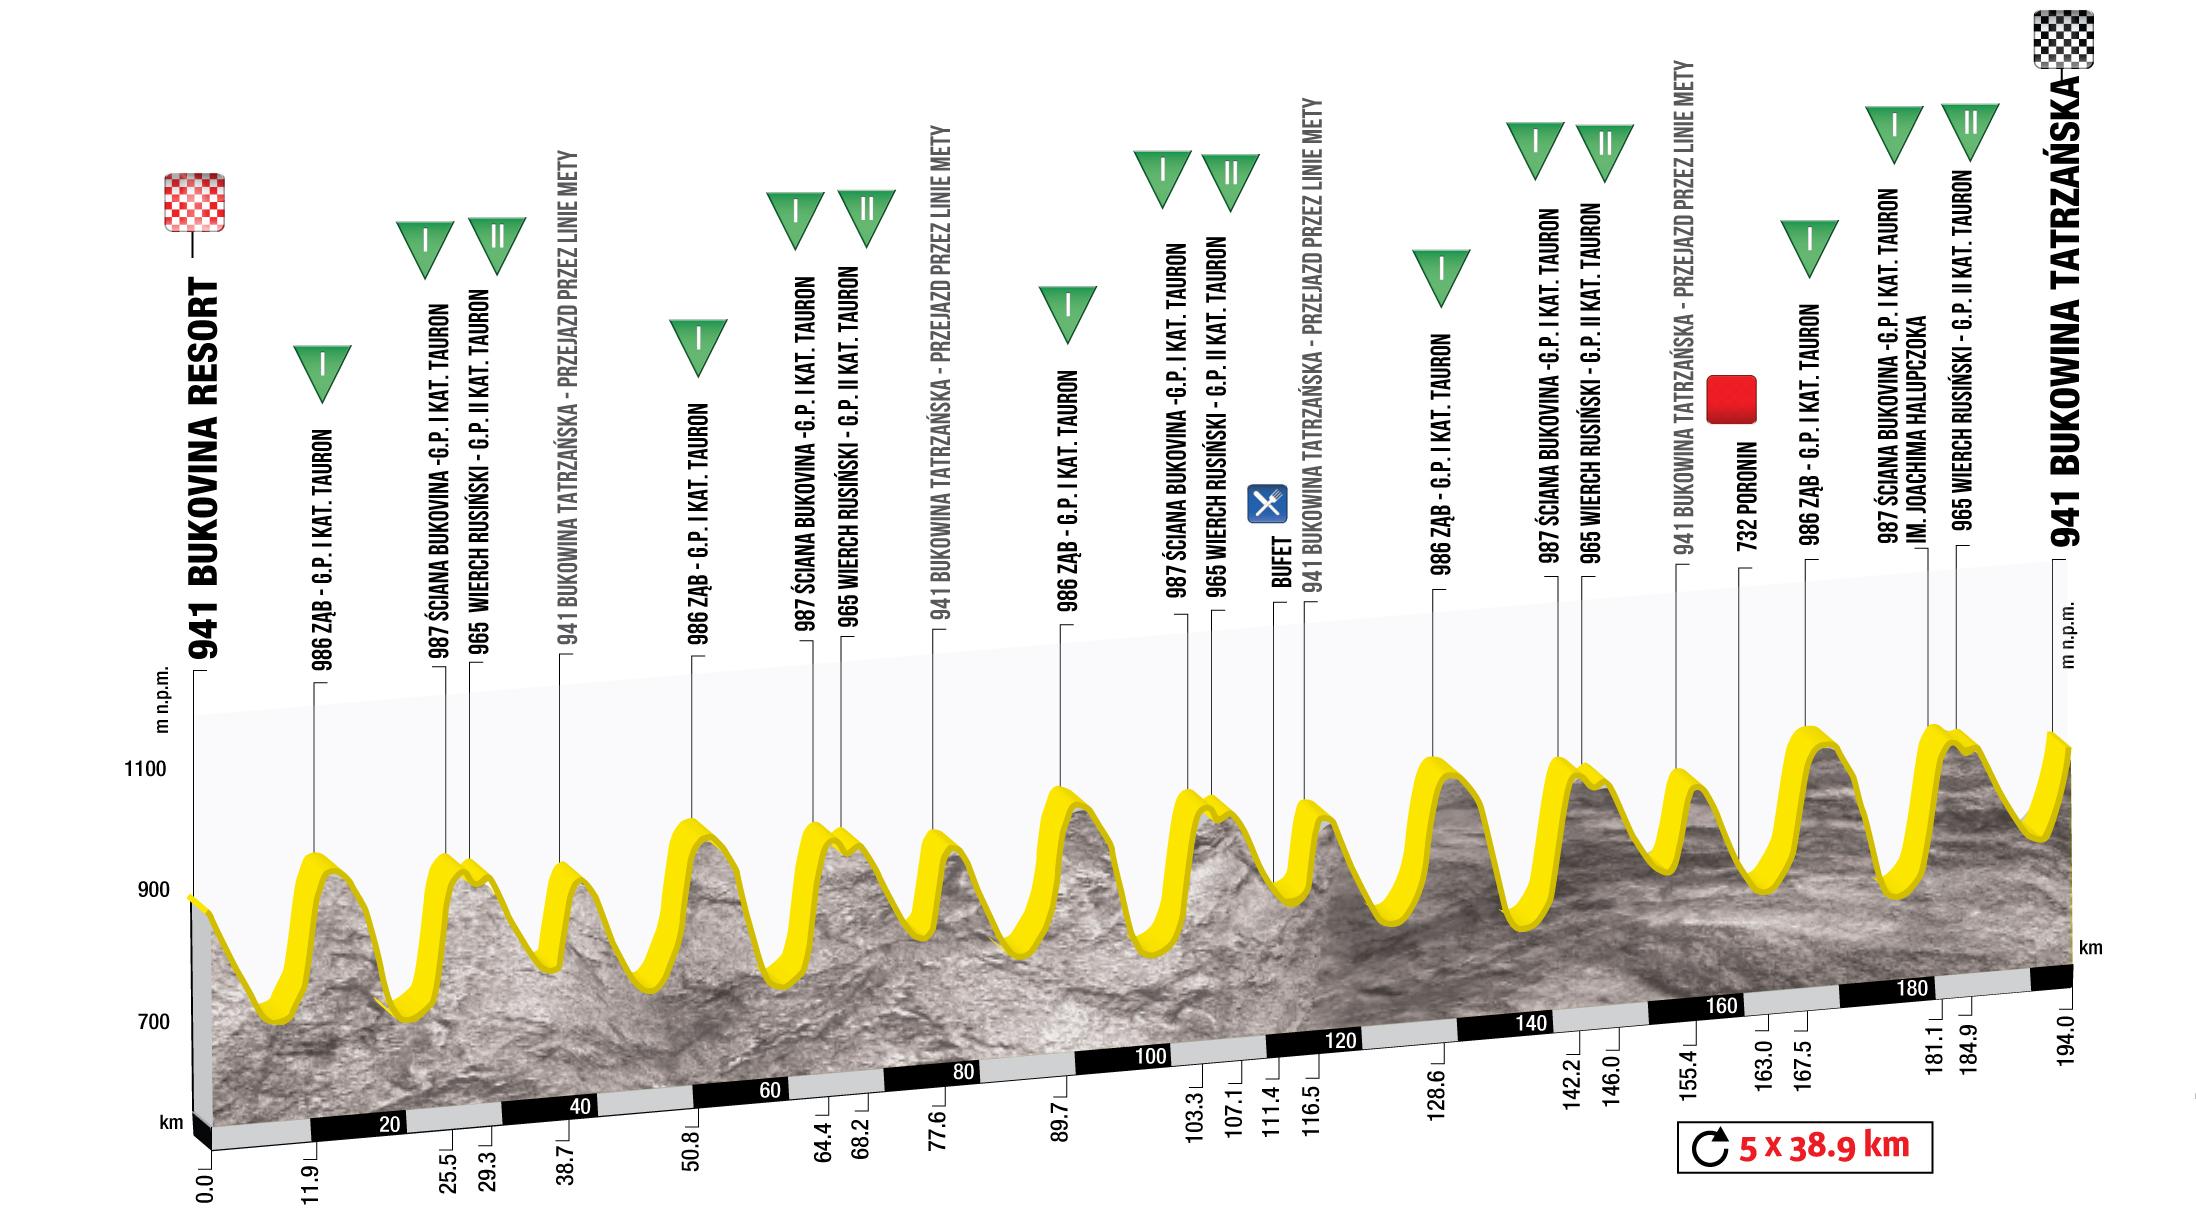 wys_etap6_TdP_UCI_WorldTour